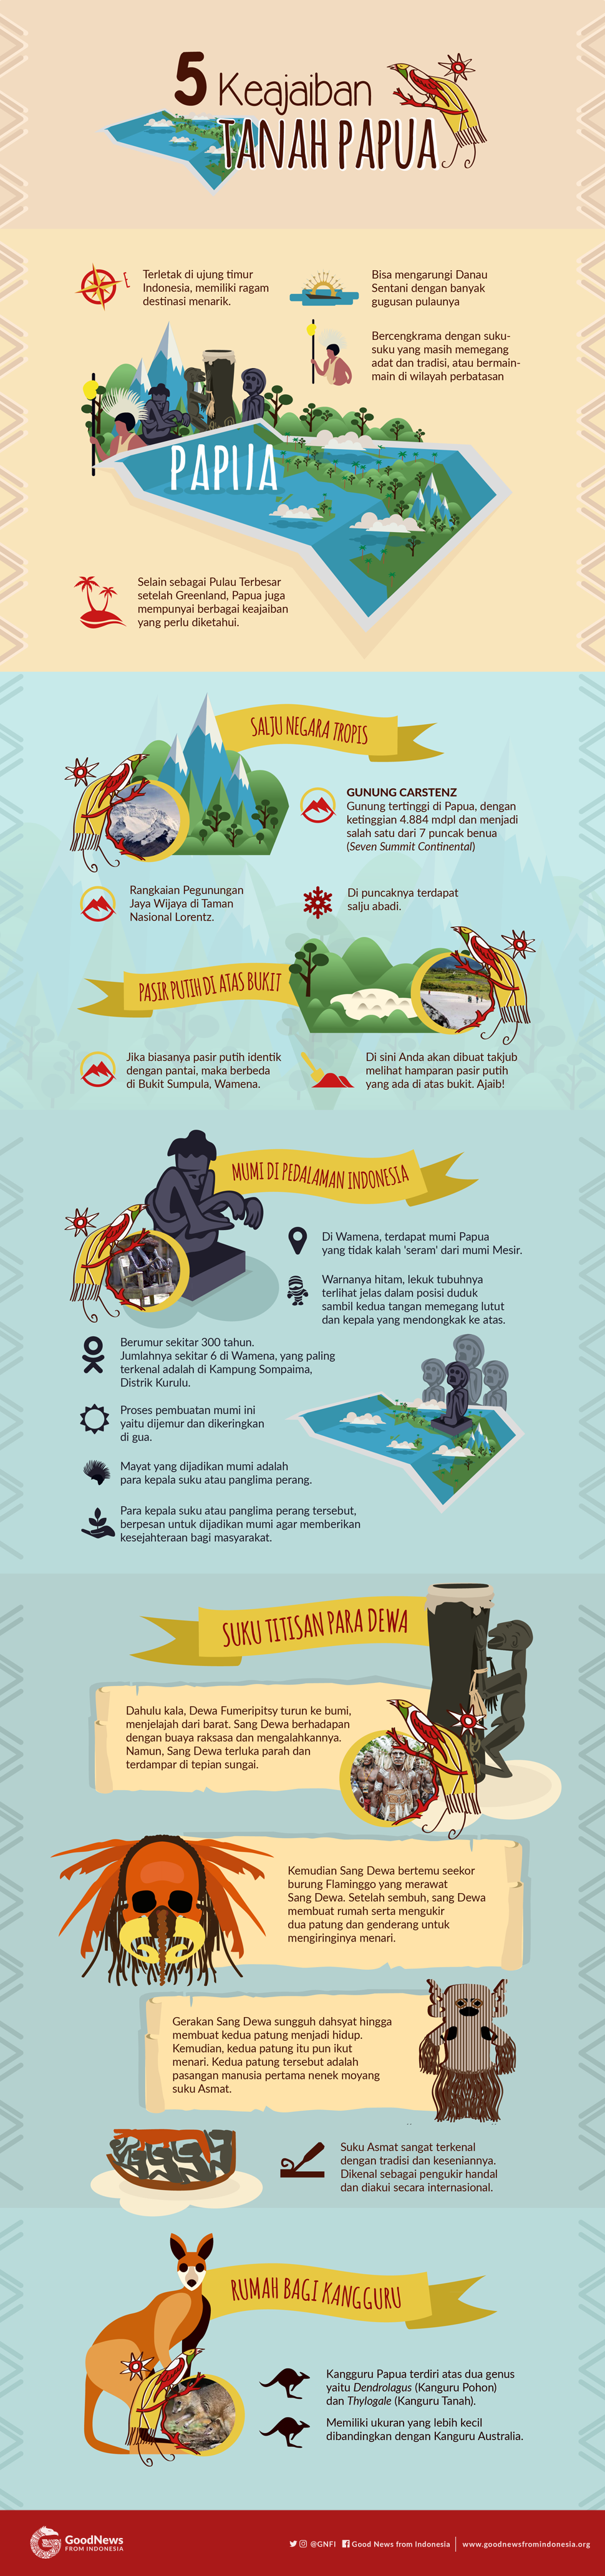 5 Keajaiban Tanah Papua